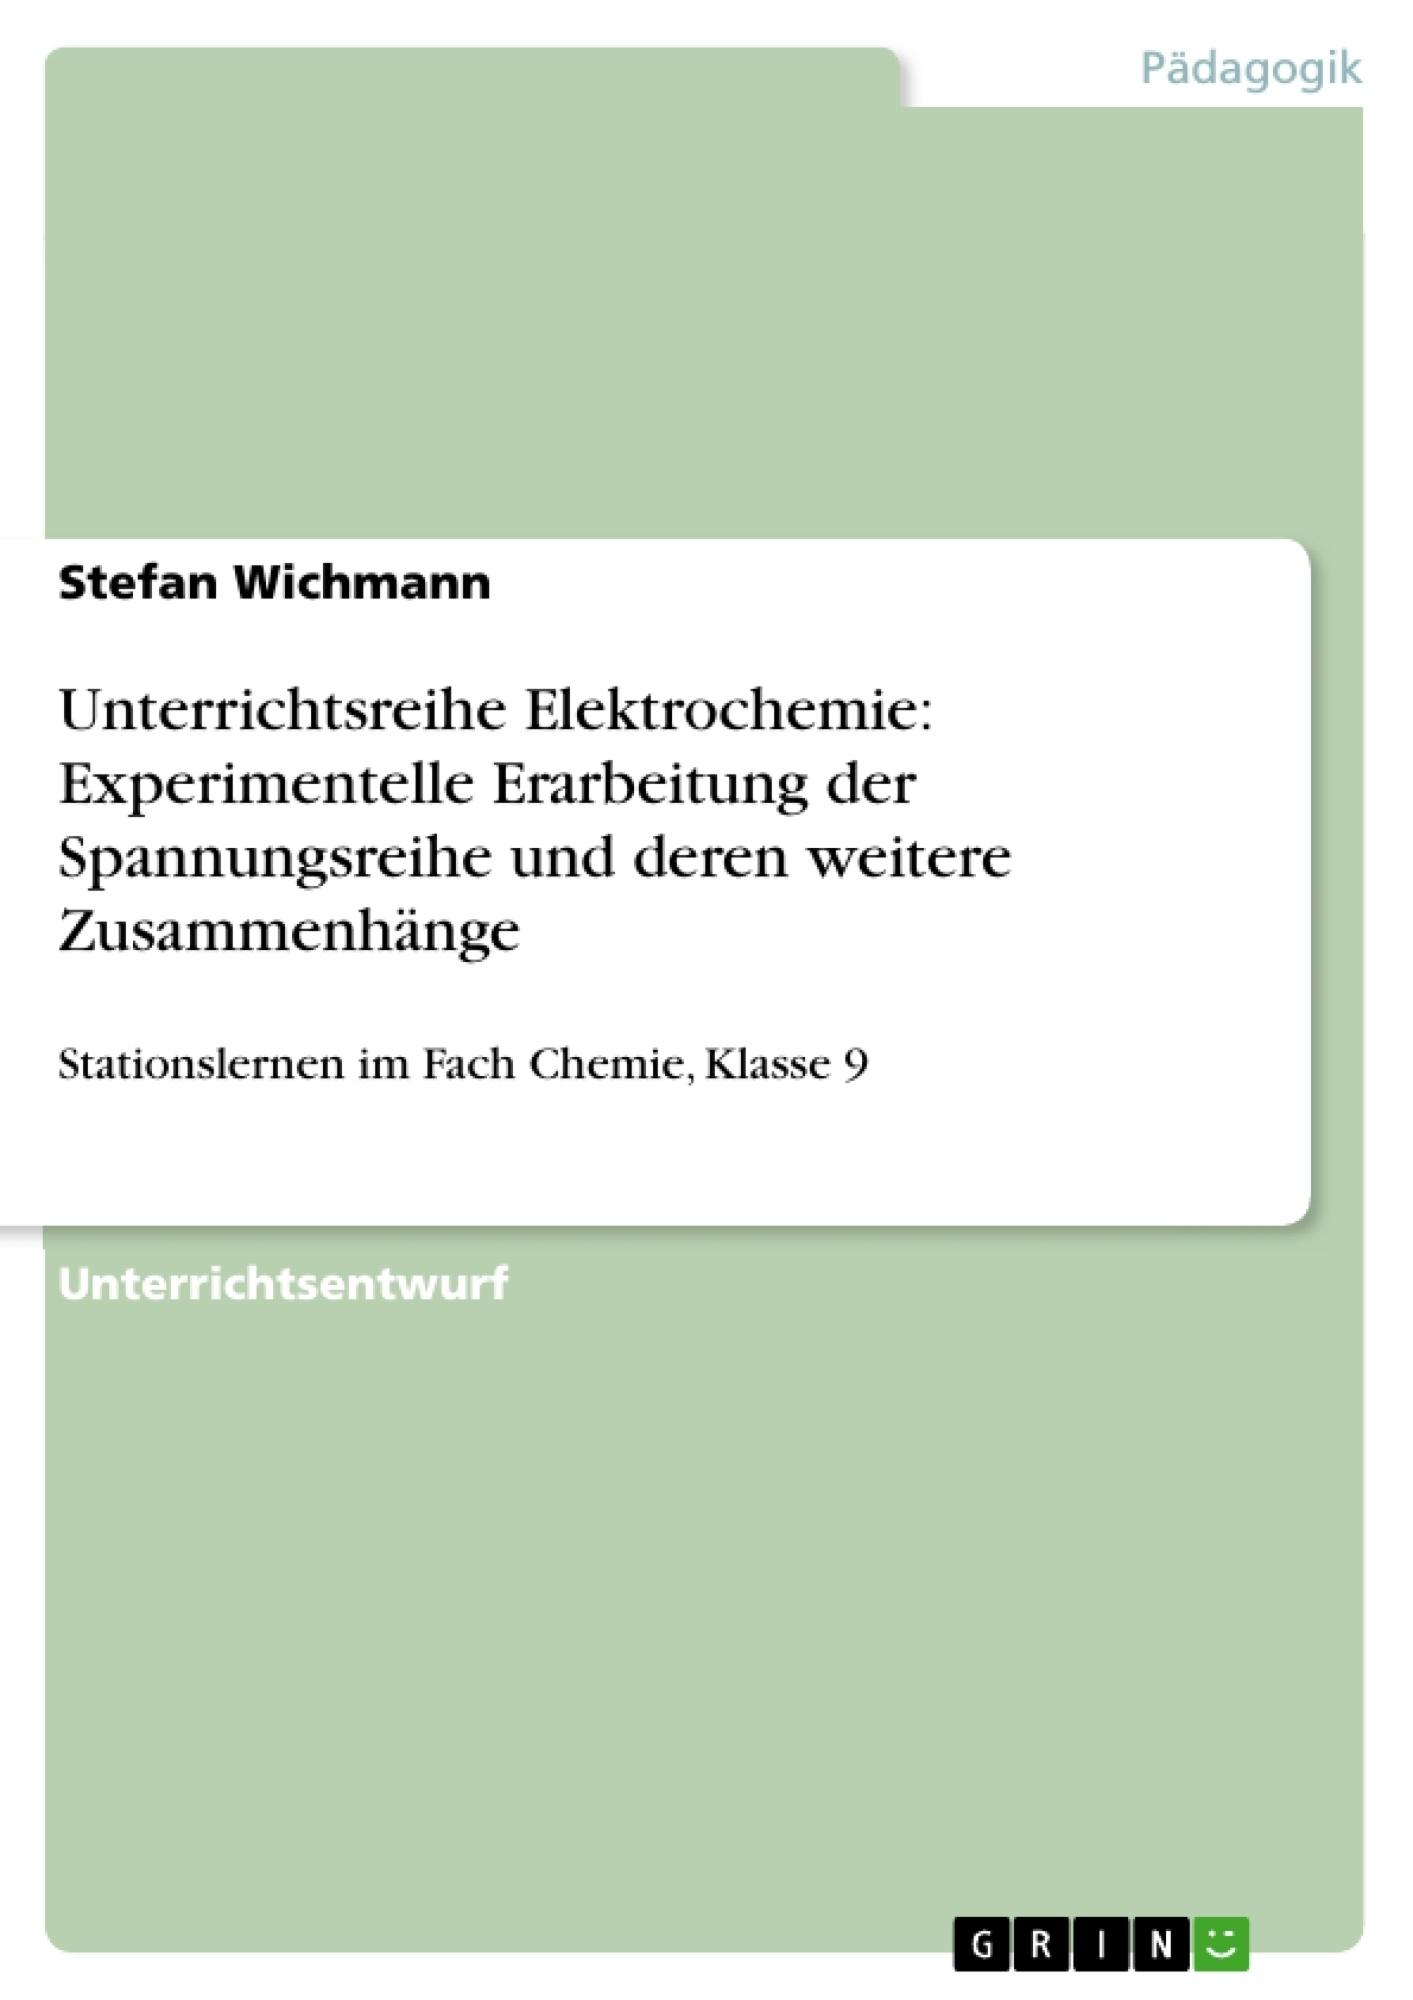 Unterrichtsreihe Elektrochemie: Experimentelle Erarbeitung der ...